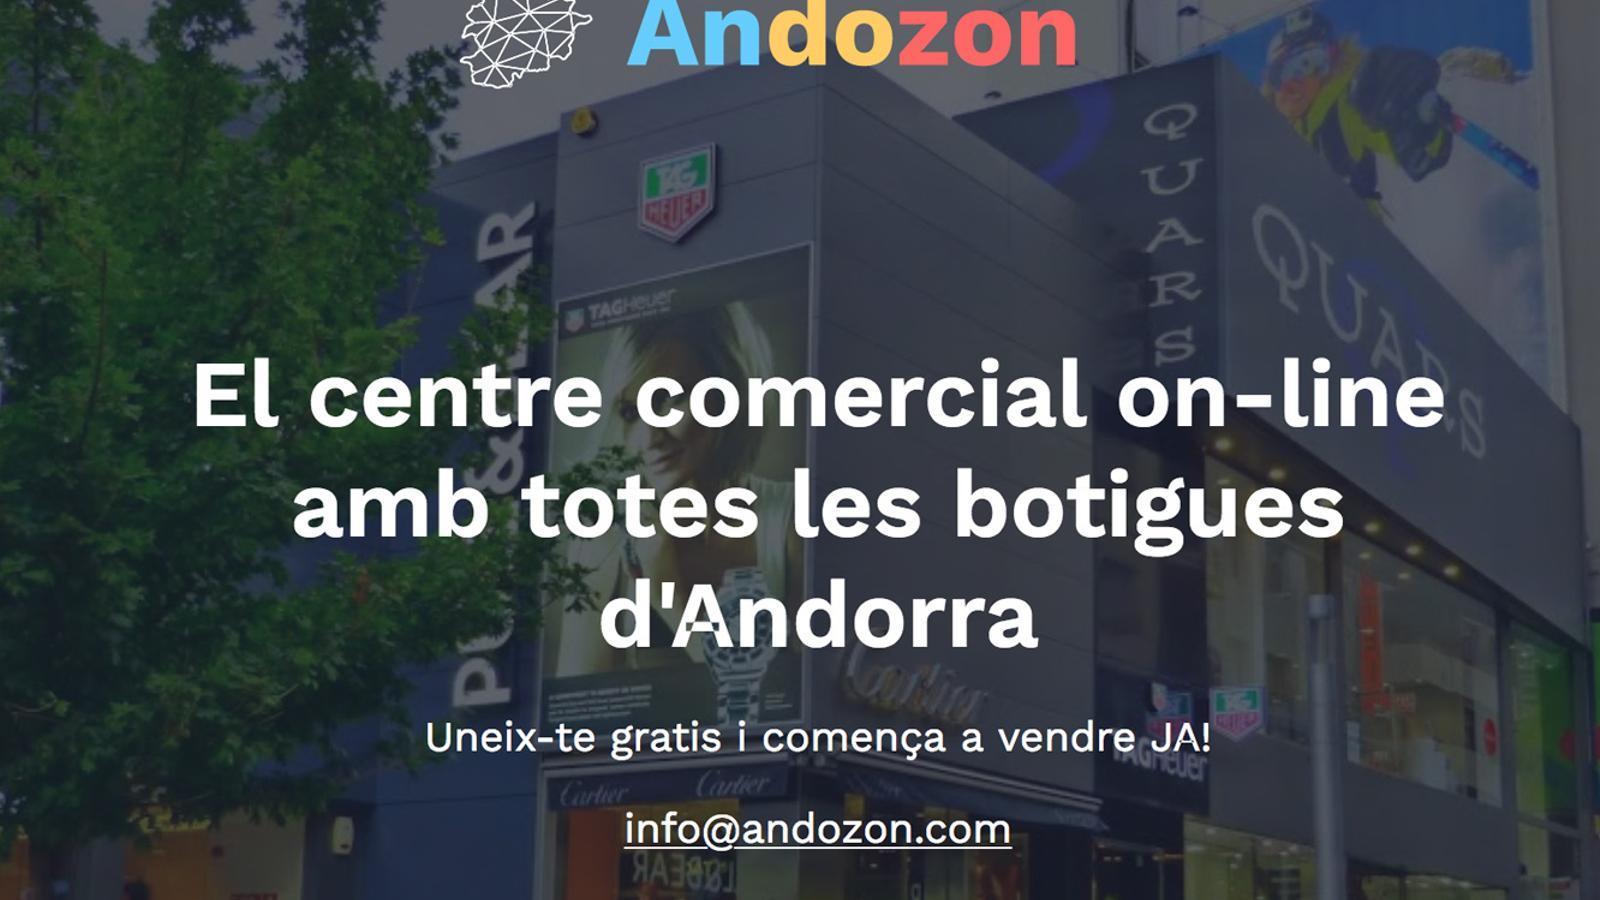 Una imatge de la plataforma Andozon.